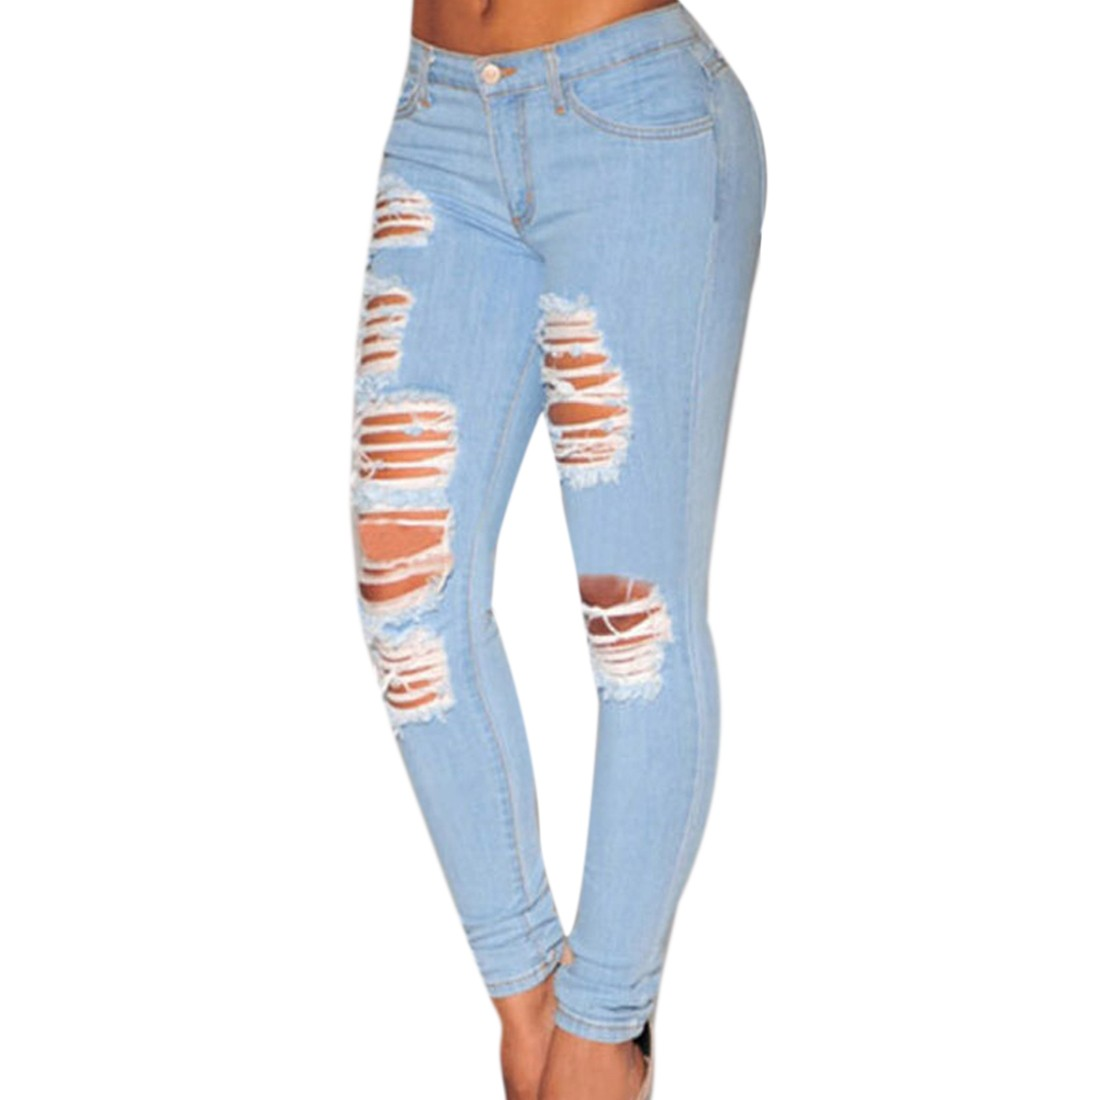 populaire femme taille haute slim broken hole boyfriend denim jean pantalon pantalon ebay. Black Bedroom Furniture Sets. Home Design Ideas